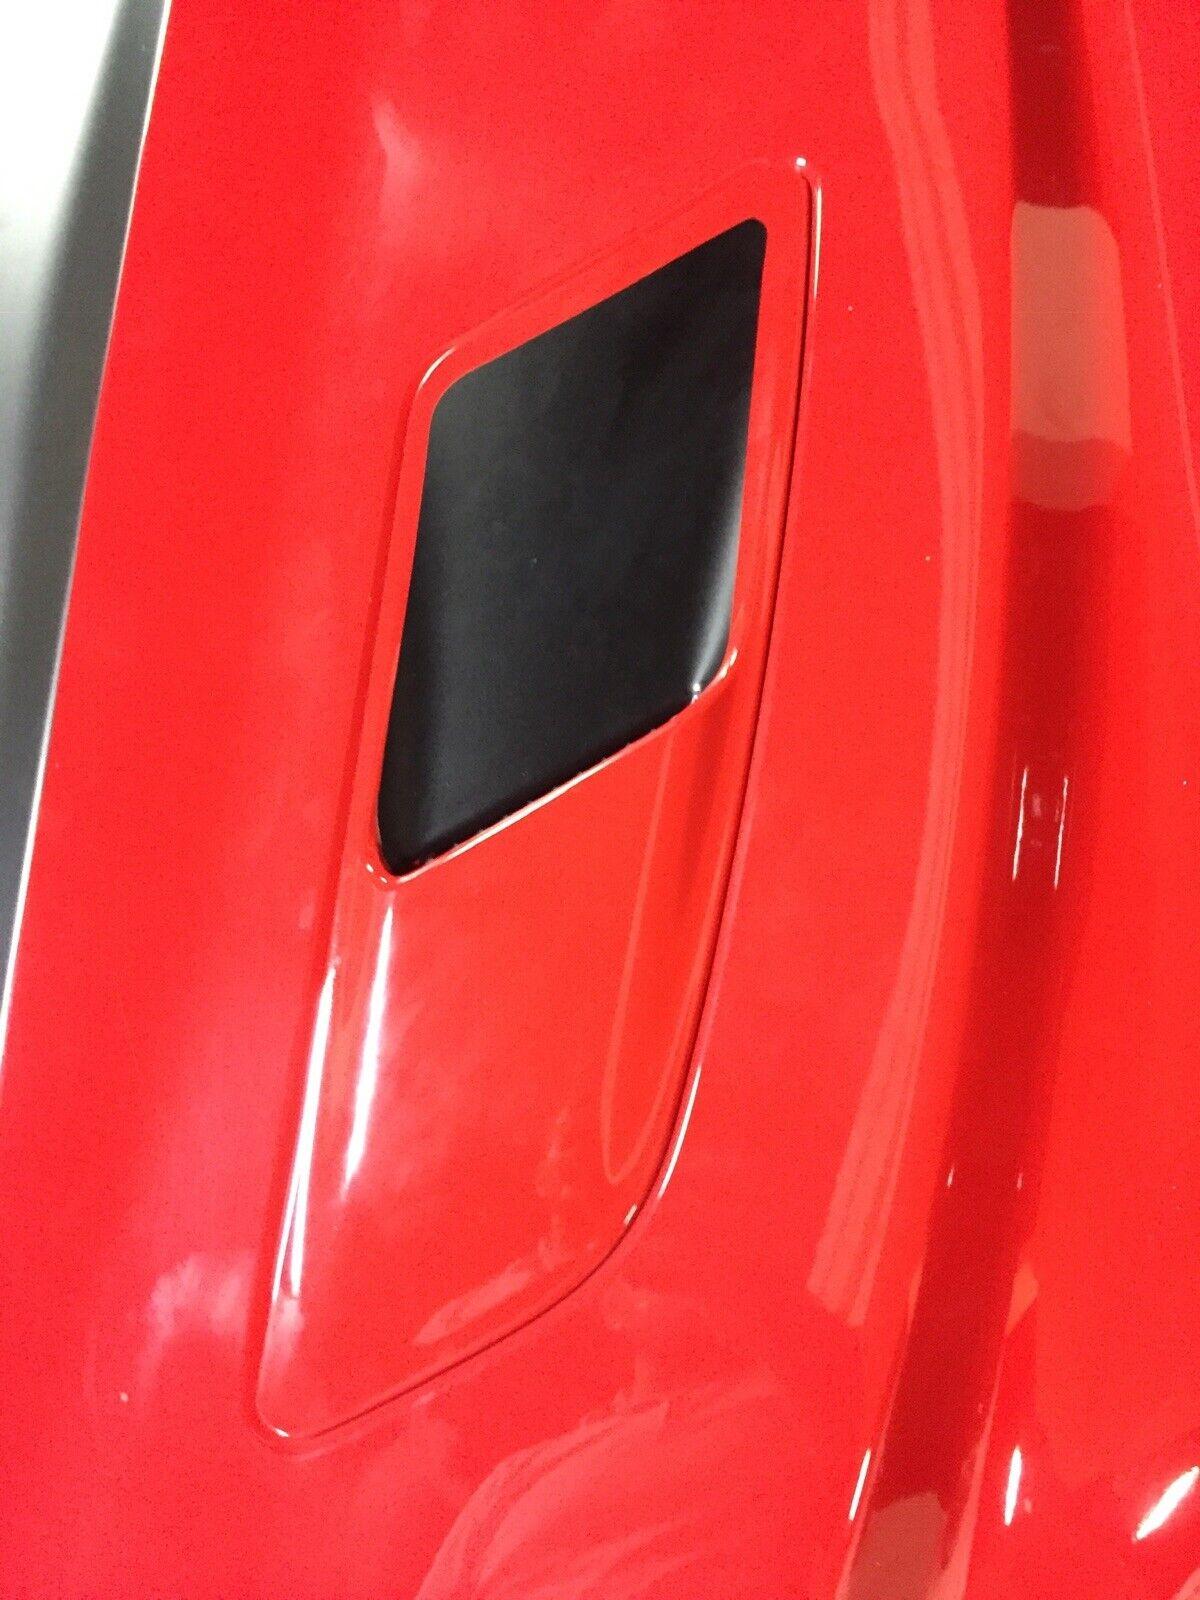 03 04 05 Buick Park Avenue—Side Fender Insert Ventiport Molding 25740950